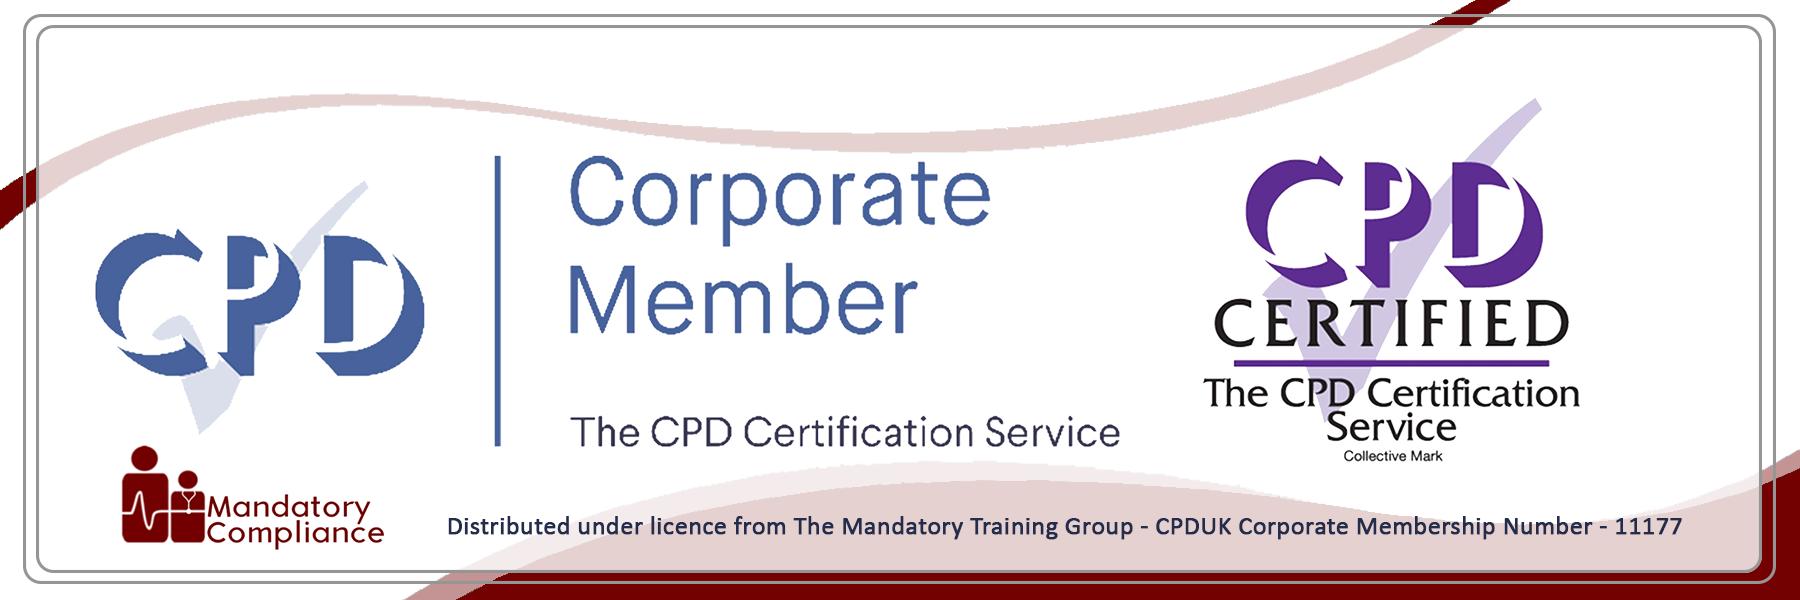 Mastering Microsoft PowerPoint 2019 - Basics - Online Learning Courses - E-Learning Courses - Mandatory Compliance UK---